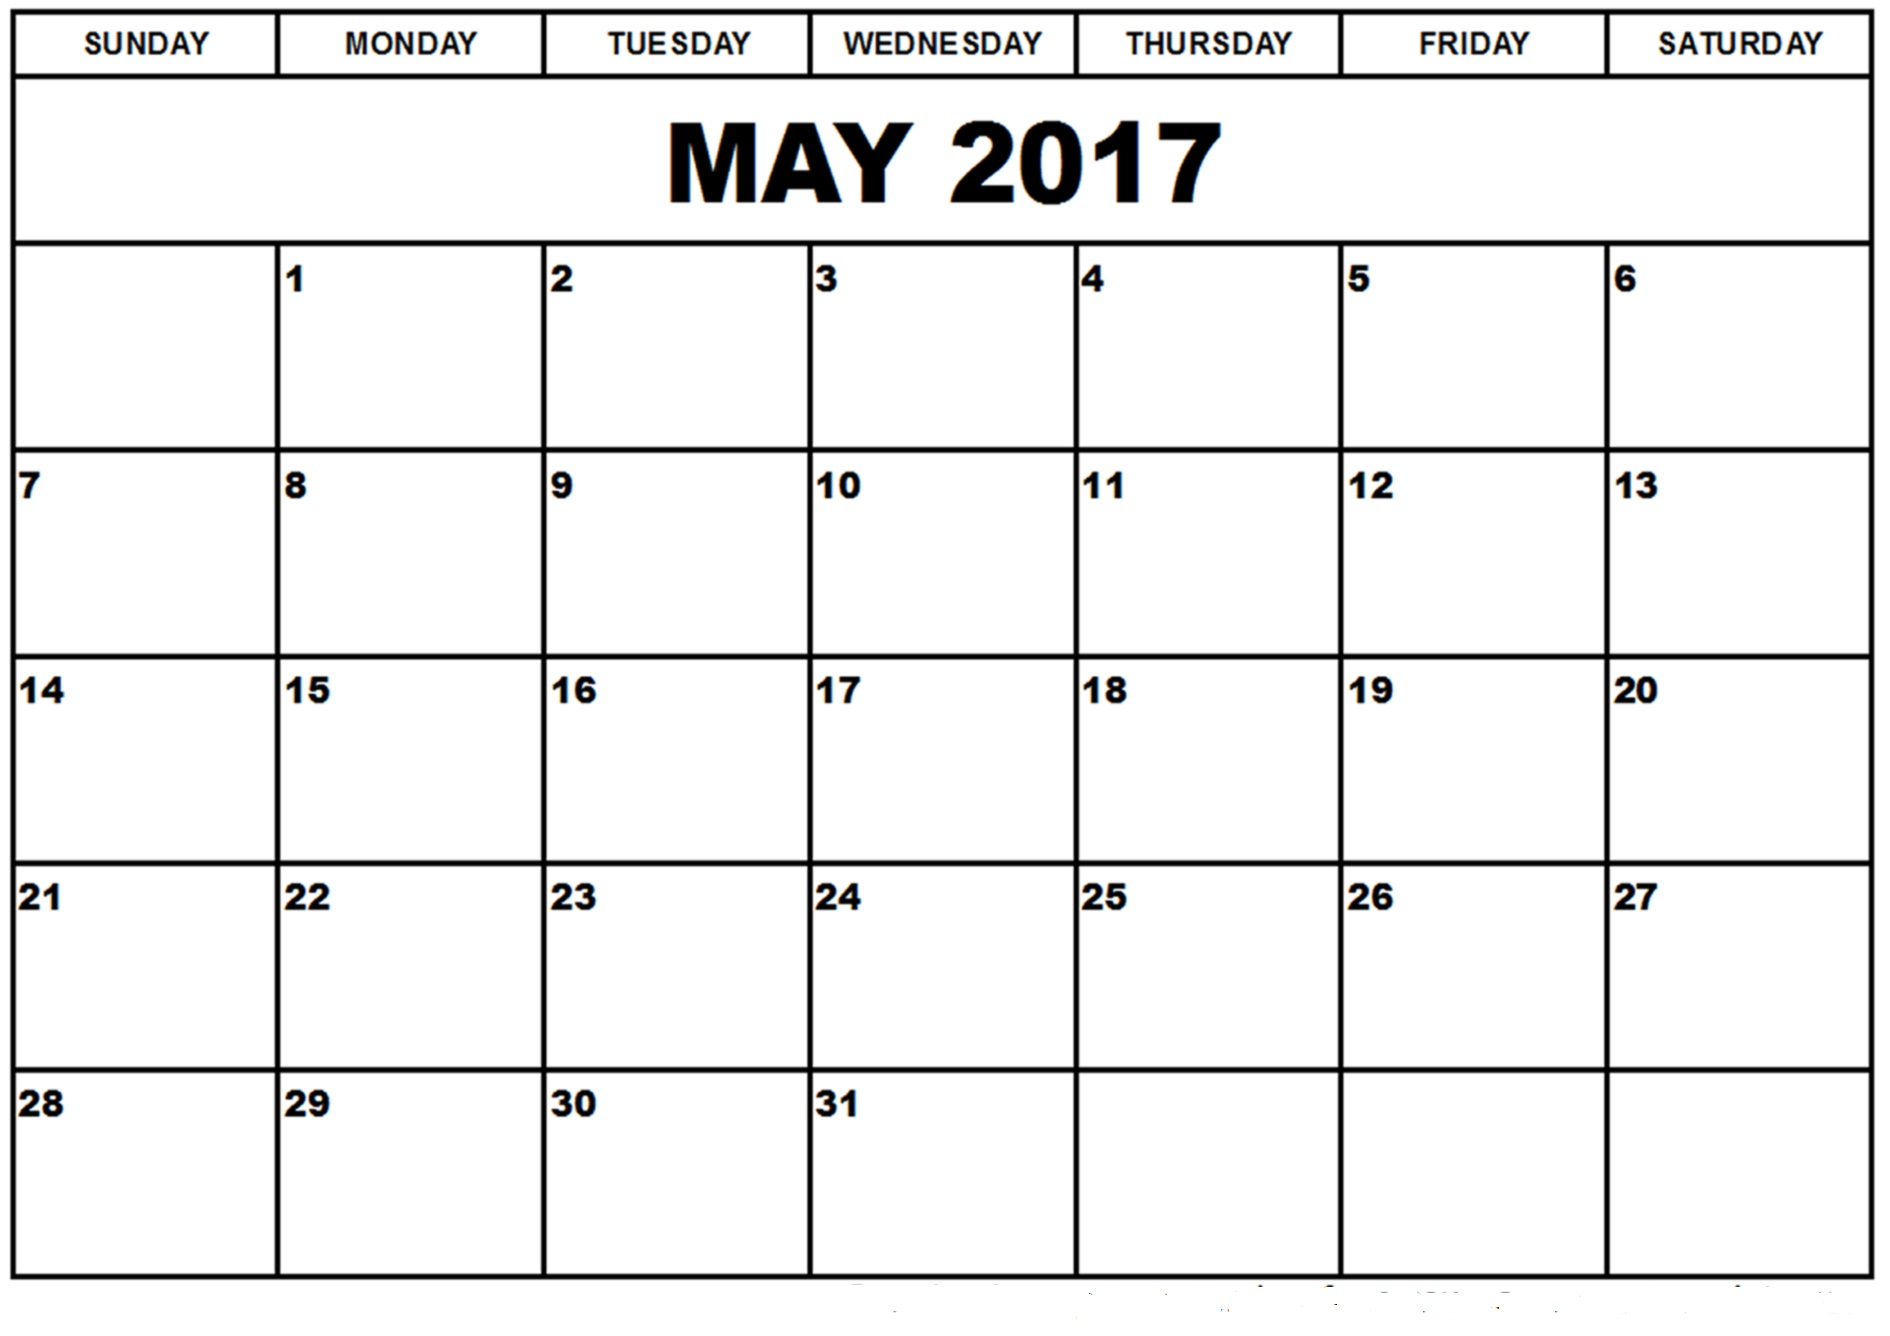 Blank Calendar Template May : Large blank may calendar printable template